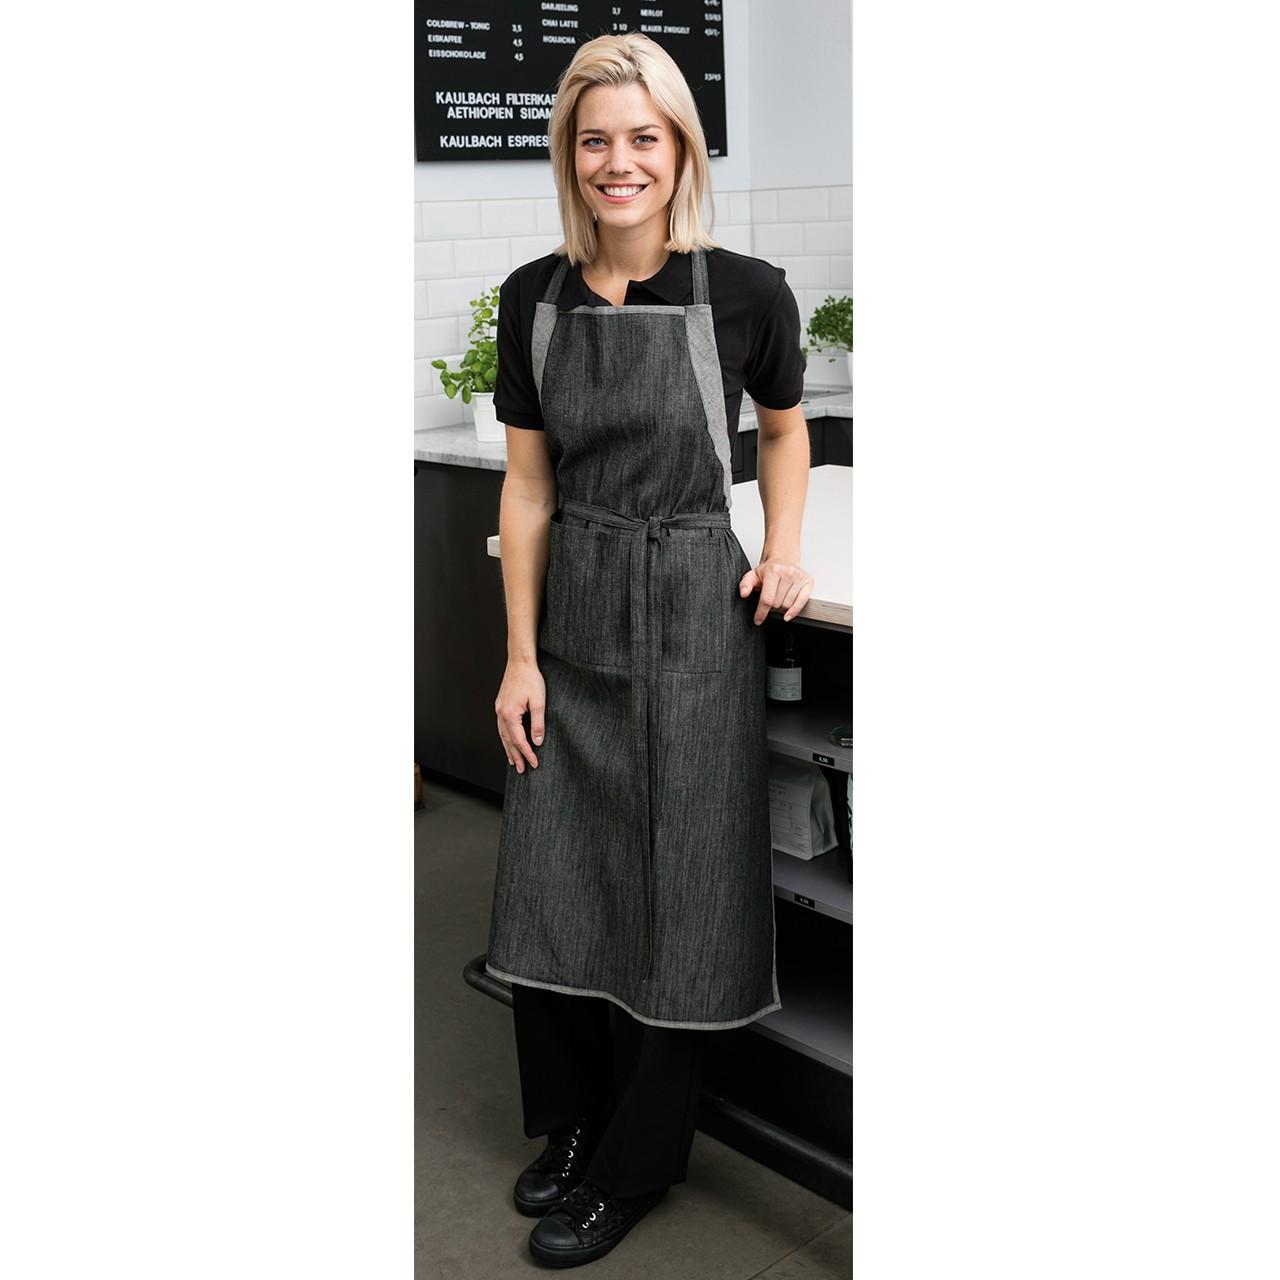 Latzschürze im Jeanslook 2-farbig Exner®   bedrucken, besticken, bedrucken lassen, besticken lassen, mit Logo  